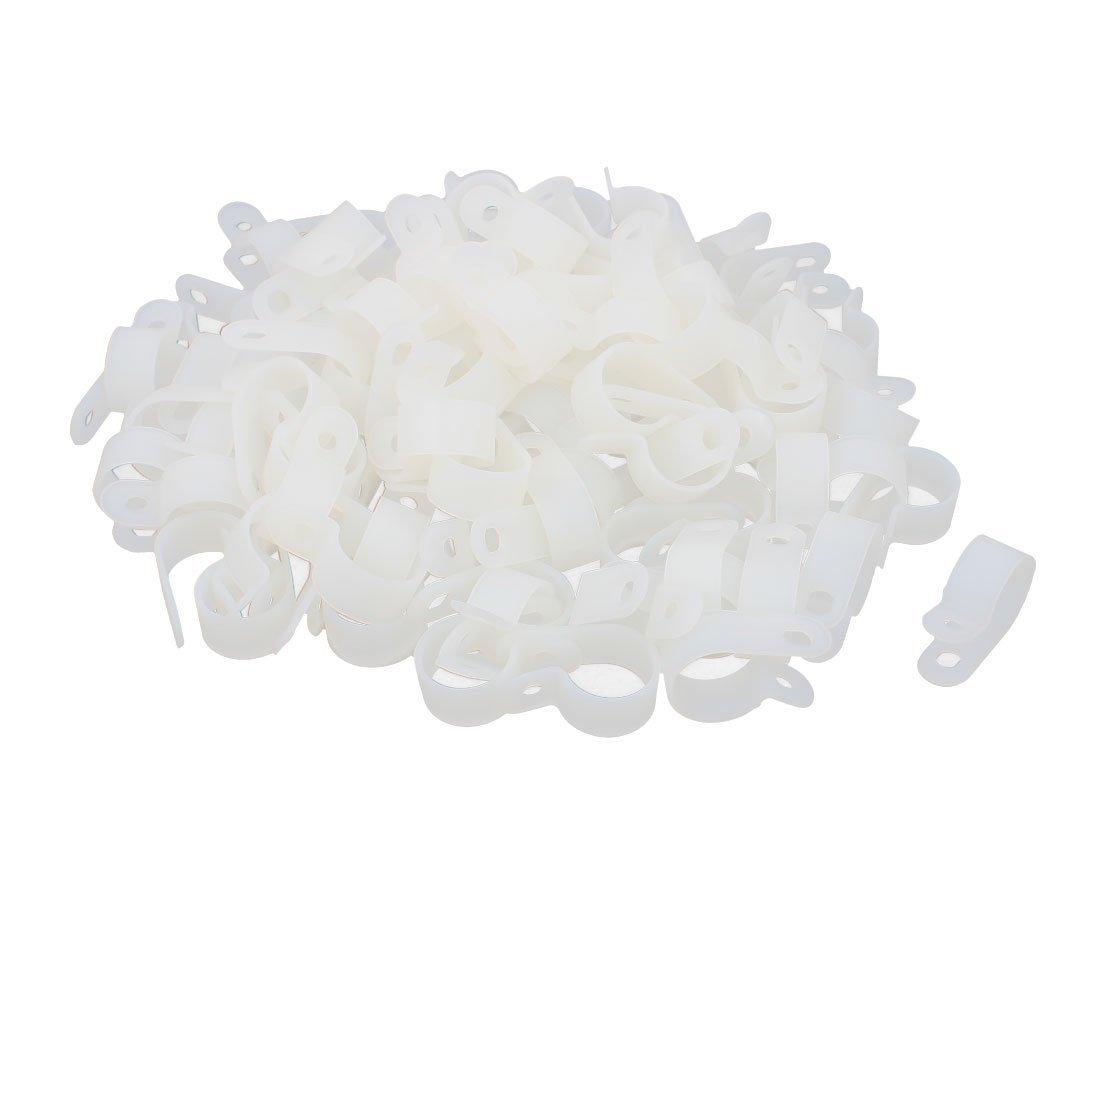 uxcell 100 PCS Nylon 20mm Dia R Type Wire Cord Clip Fixer Cable Clamp Fastener Harness